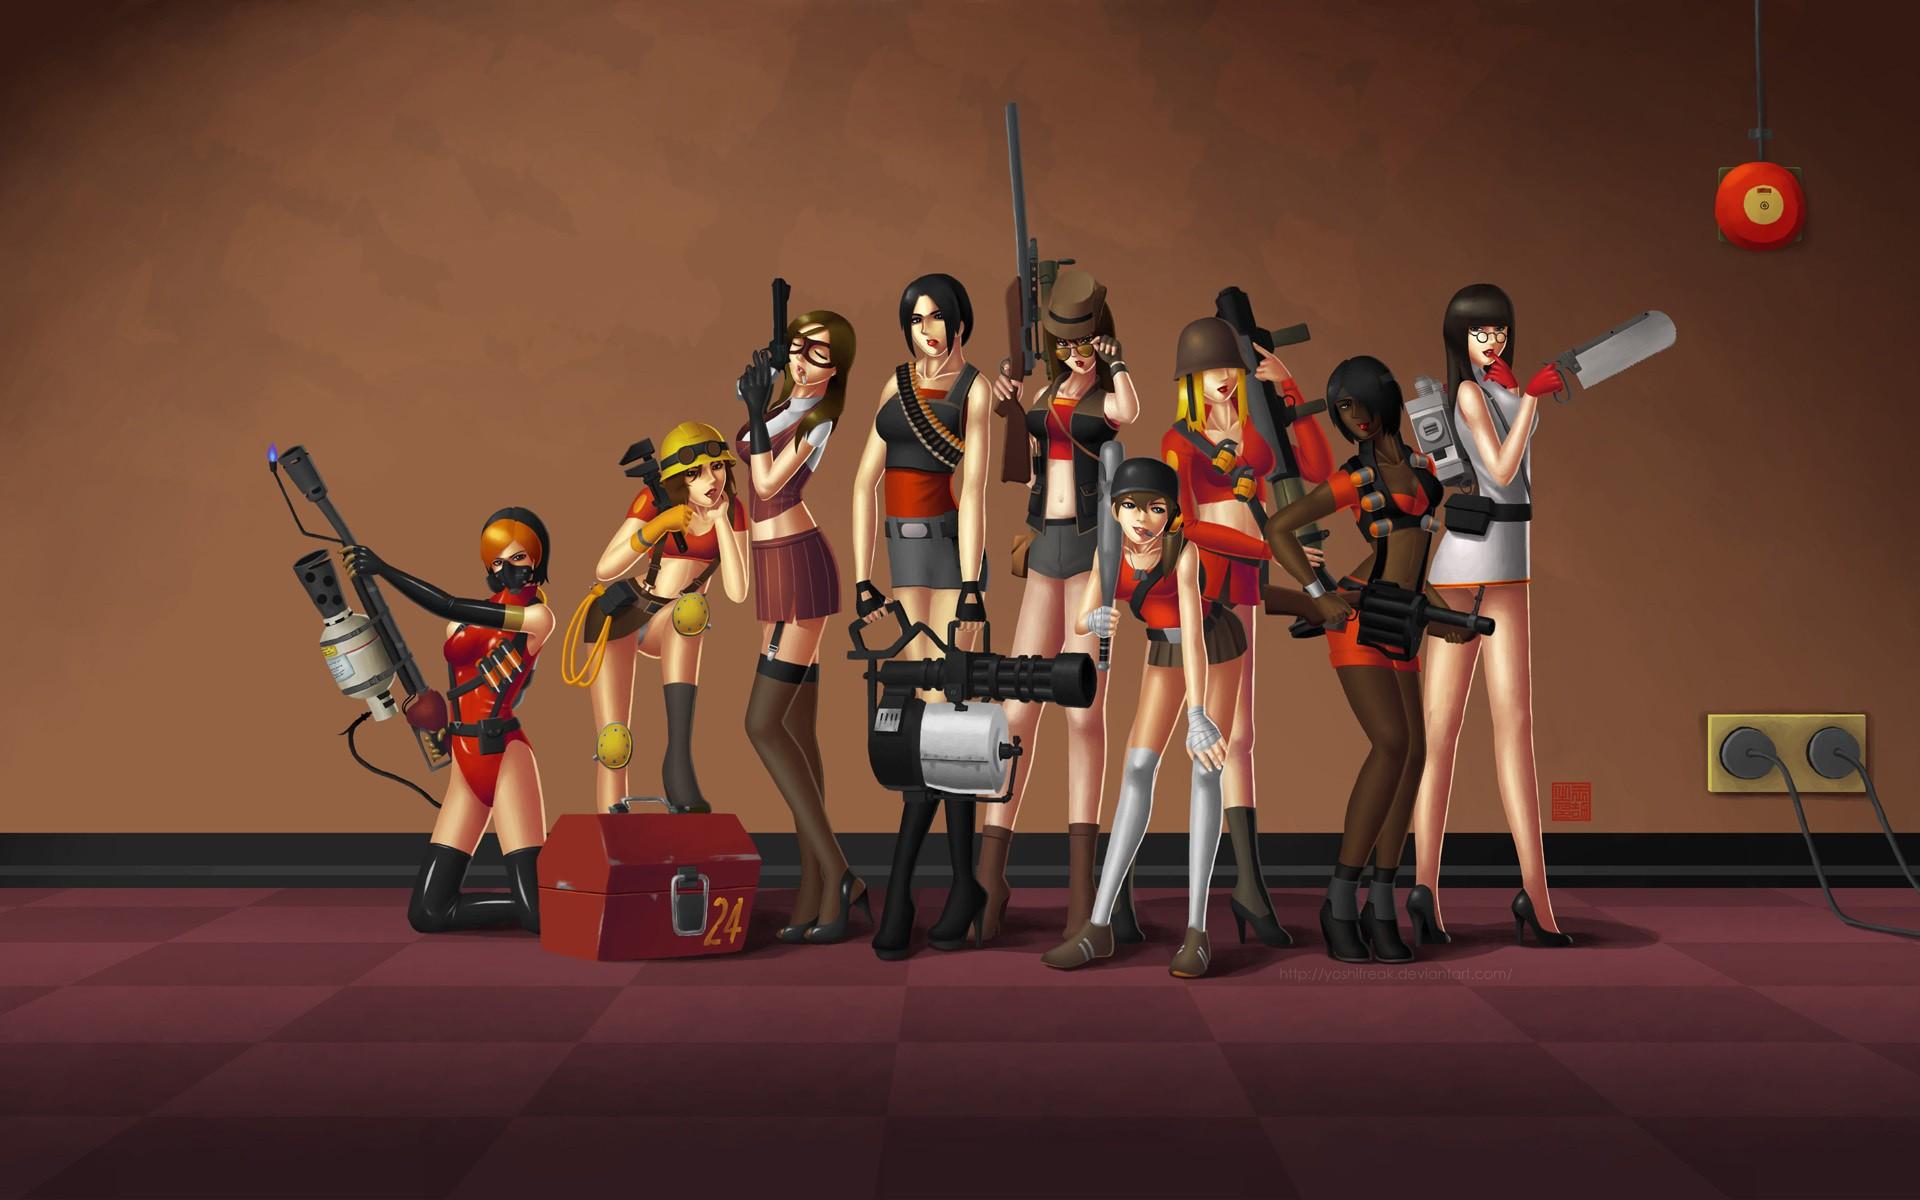 wallpaper Team Fortress 2